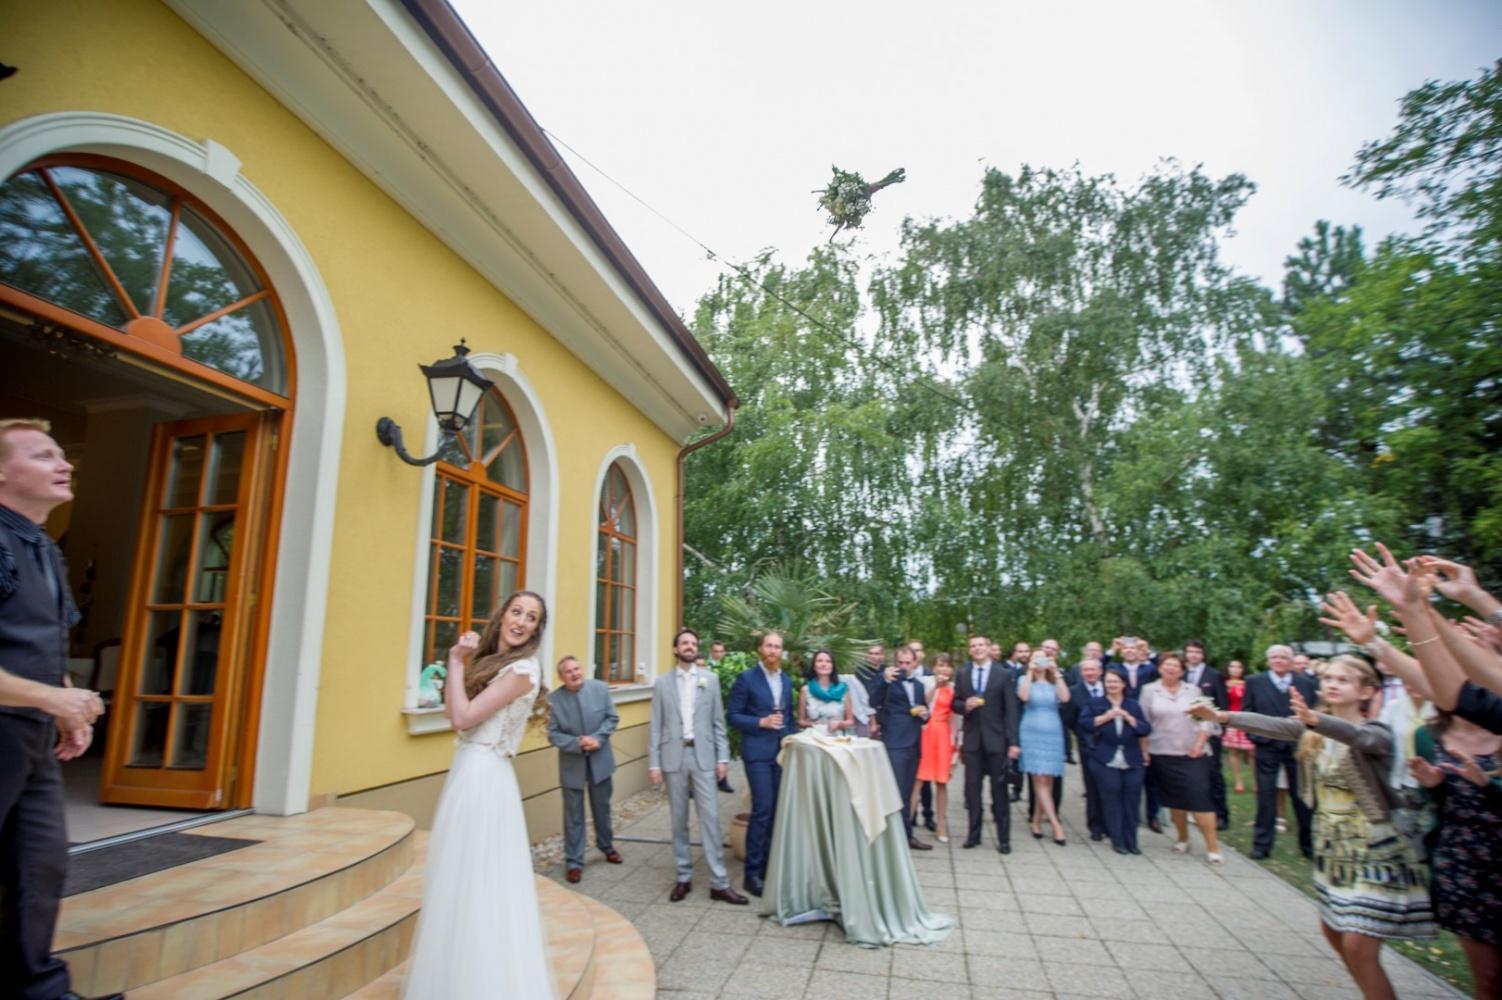 http://www.fotoz.sk/images/gallery-36/normal/svadobny-fotograf_eskuvoi-fotos_lacny-fotograf_fotograf-na-svadbu_plauter-kuria_fotograf-nitra_fotograf-galanta_juraj-zsok271.jpg